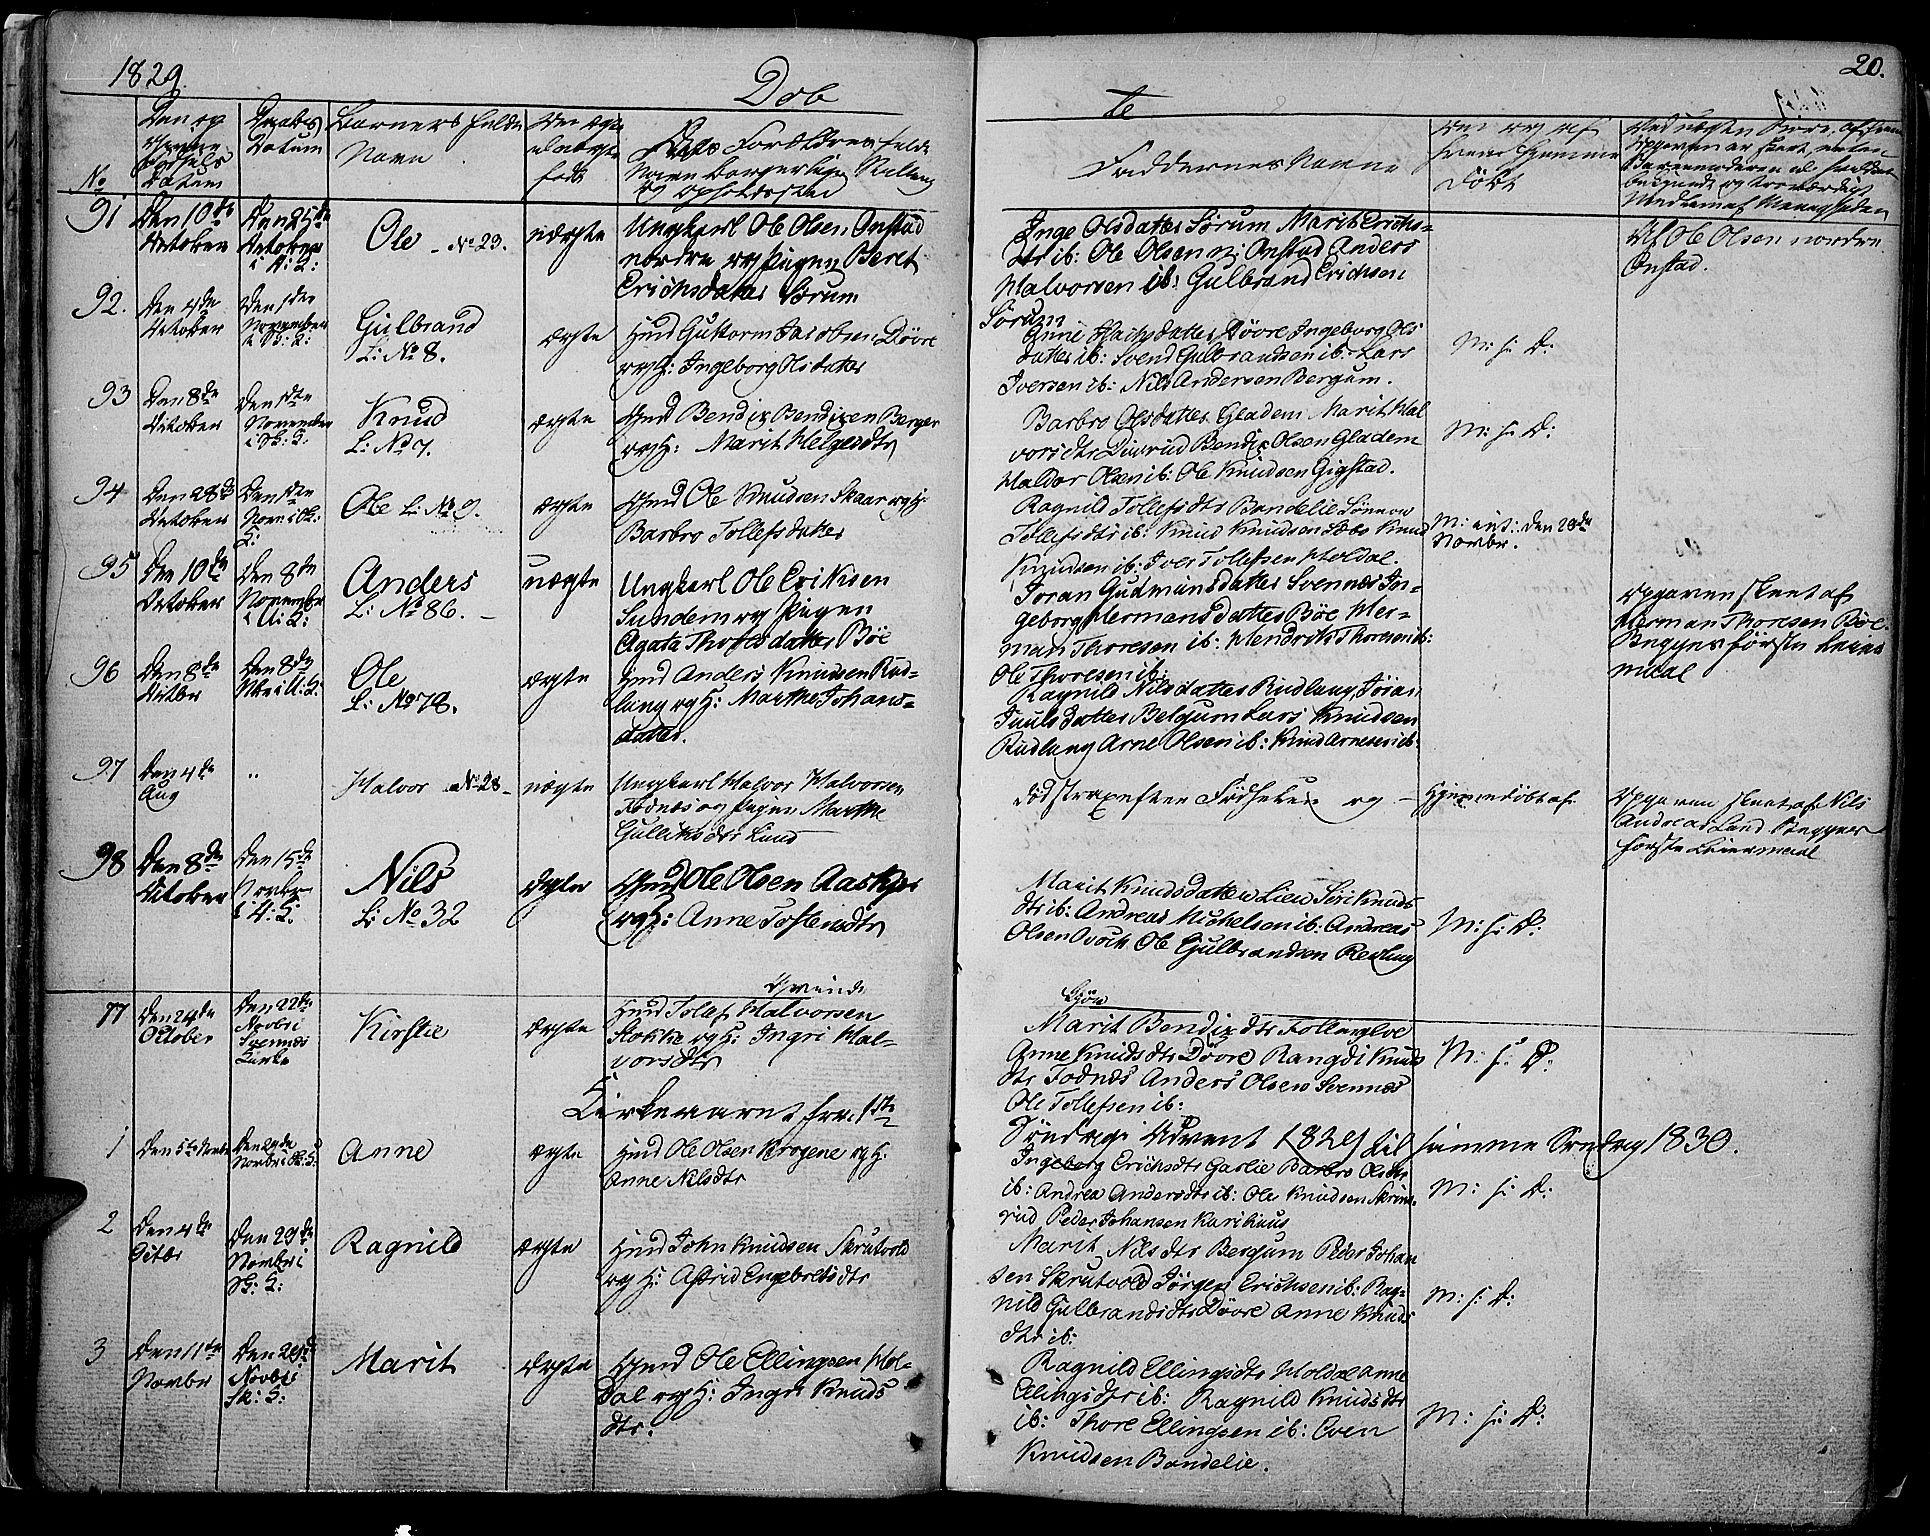 SAH, Nord-Aurdal prestekontor, Ministerialbok nr. 3, 1828-1841, s. 20